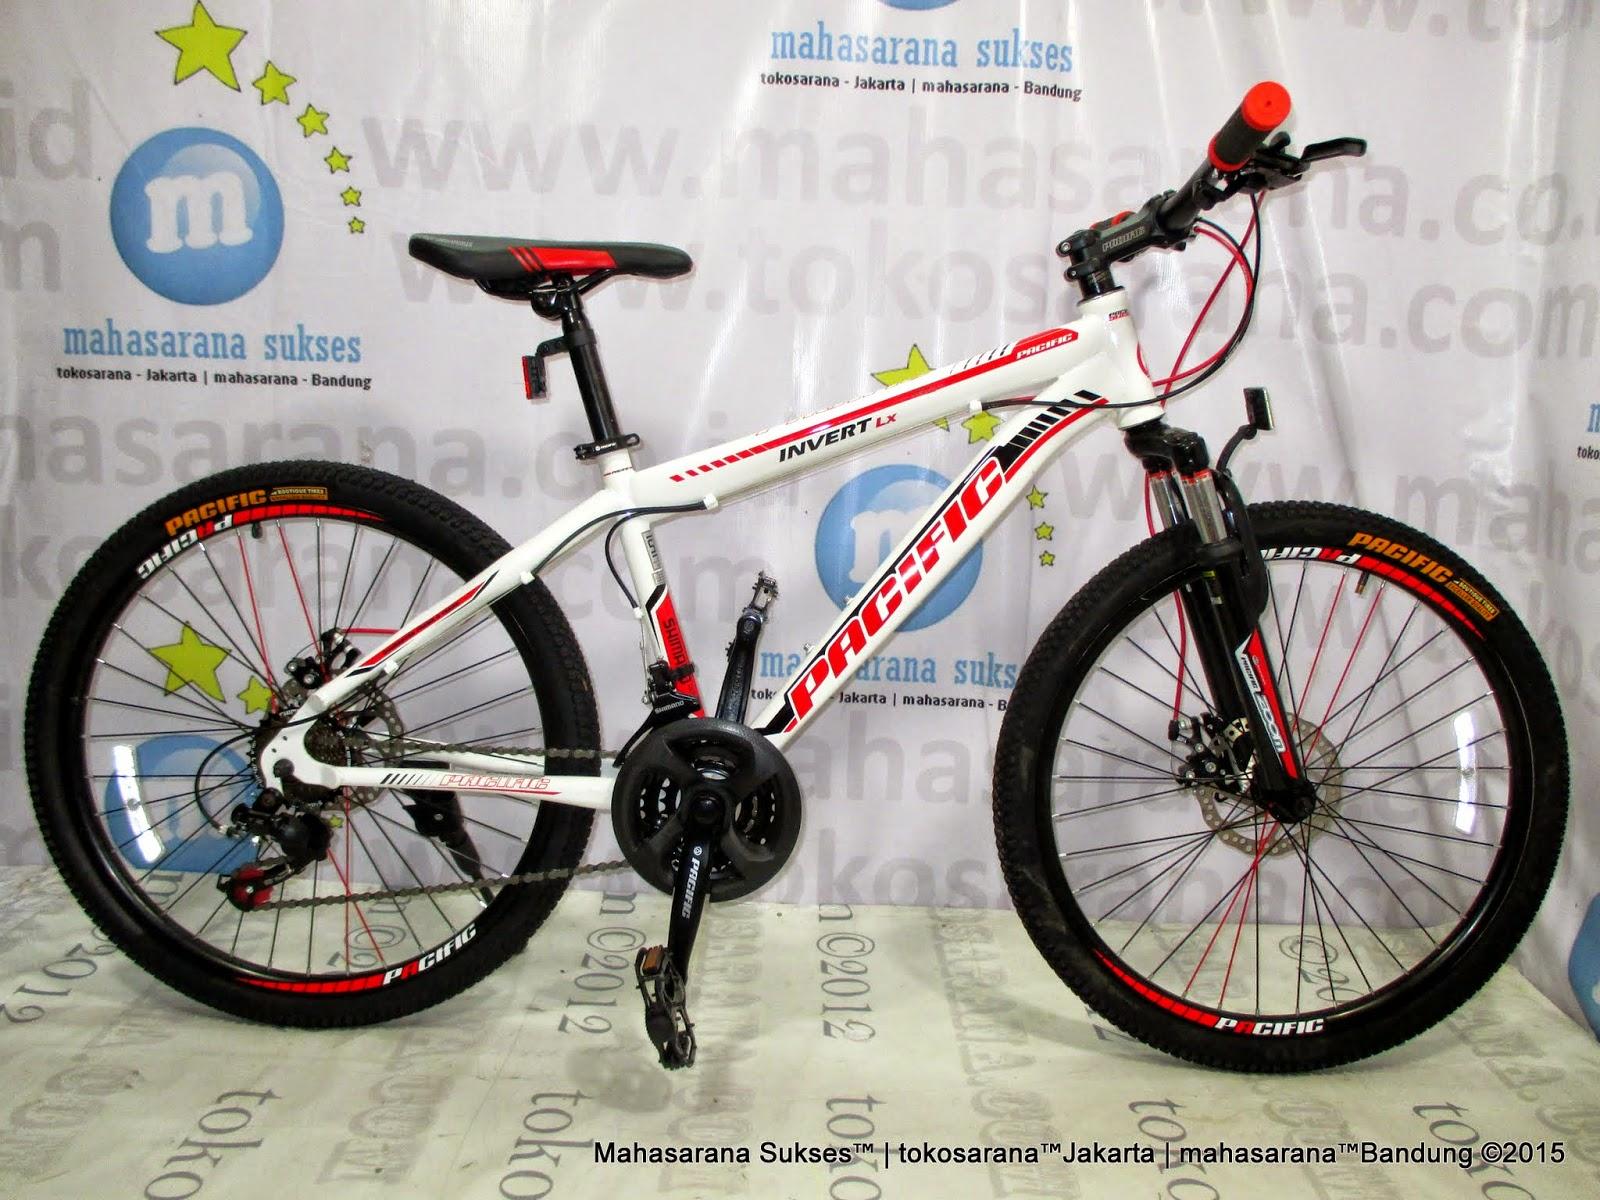 tokosarana™Jakarta Jatinegara Sepeda Gunung Remaja